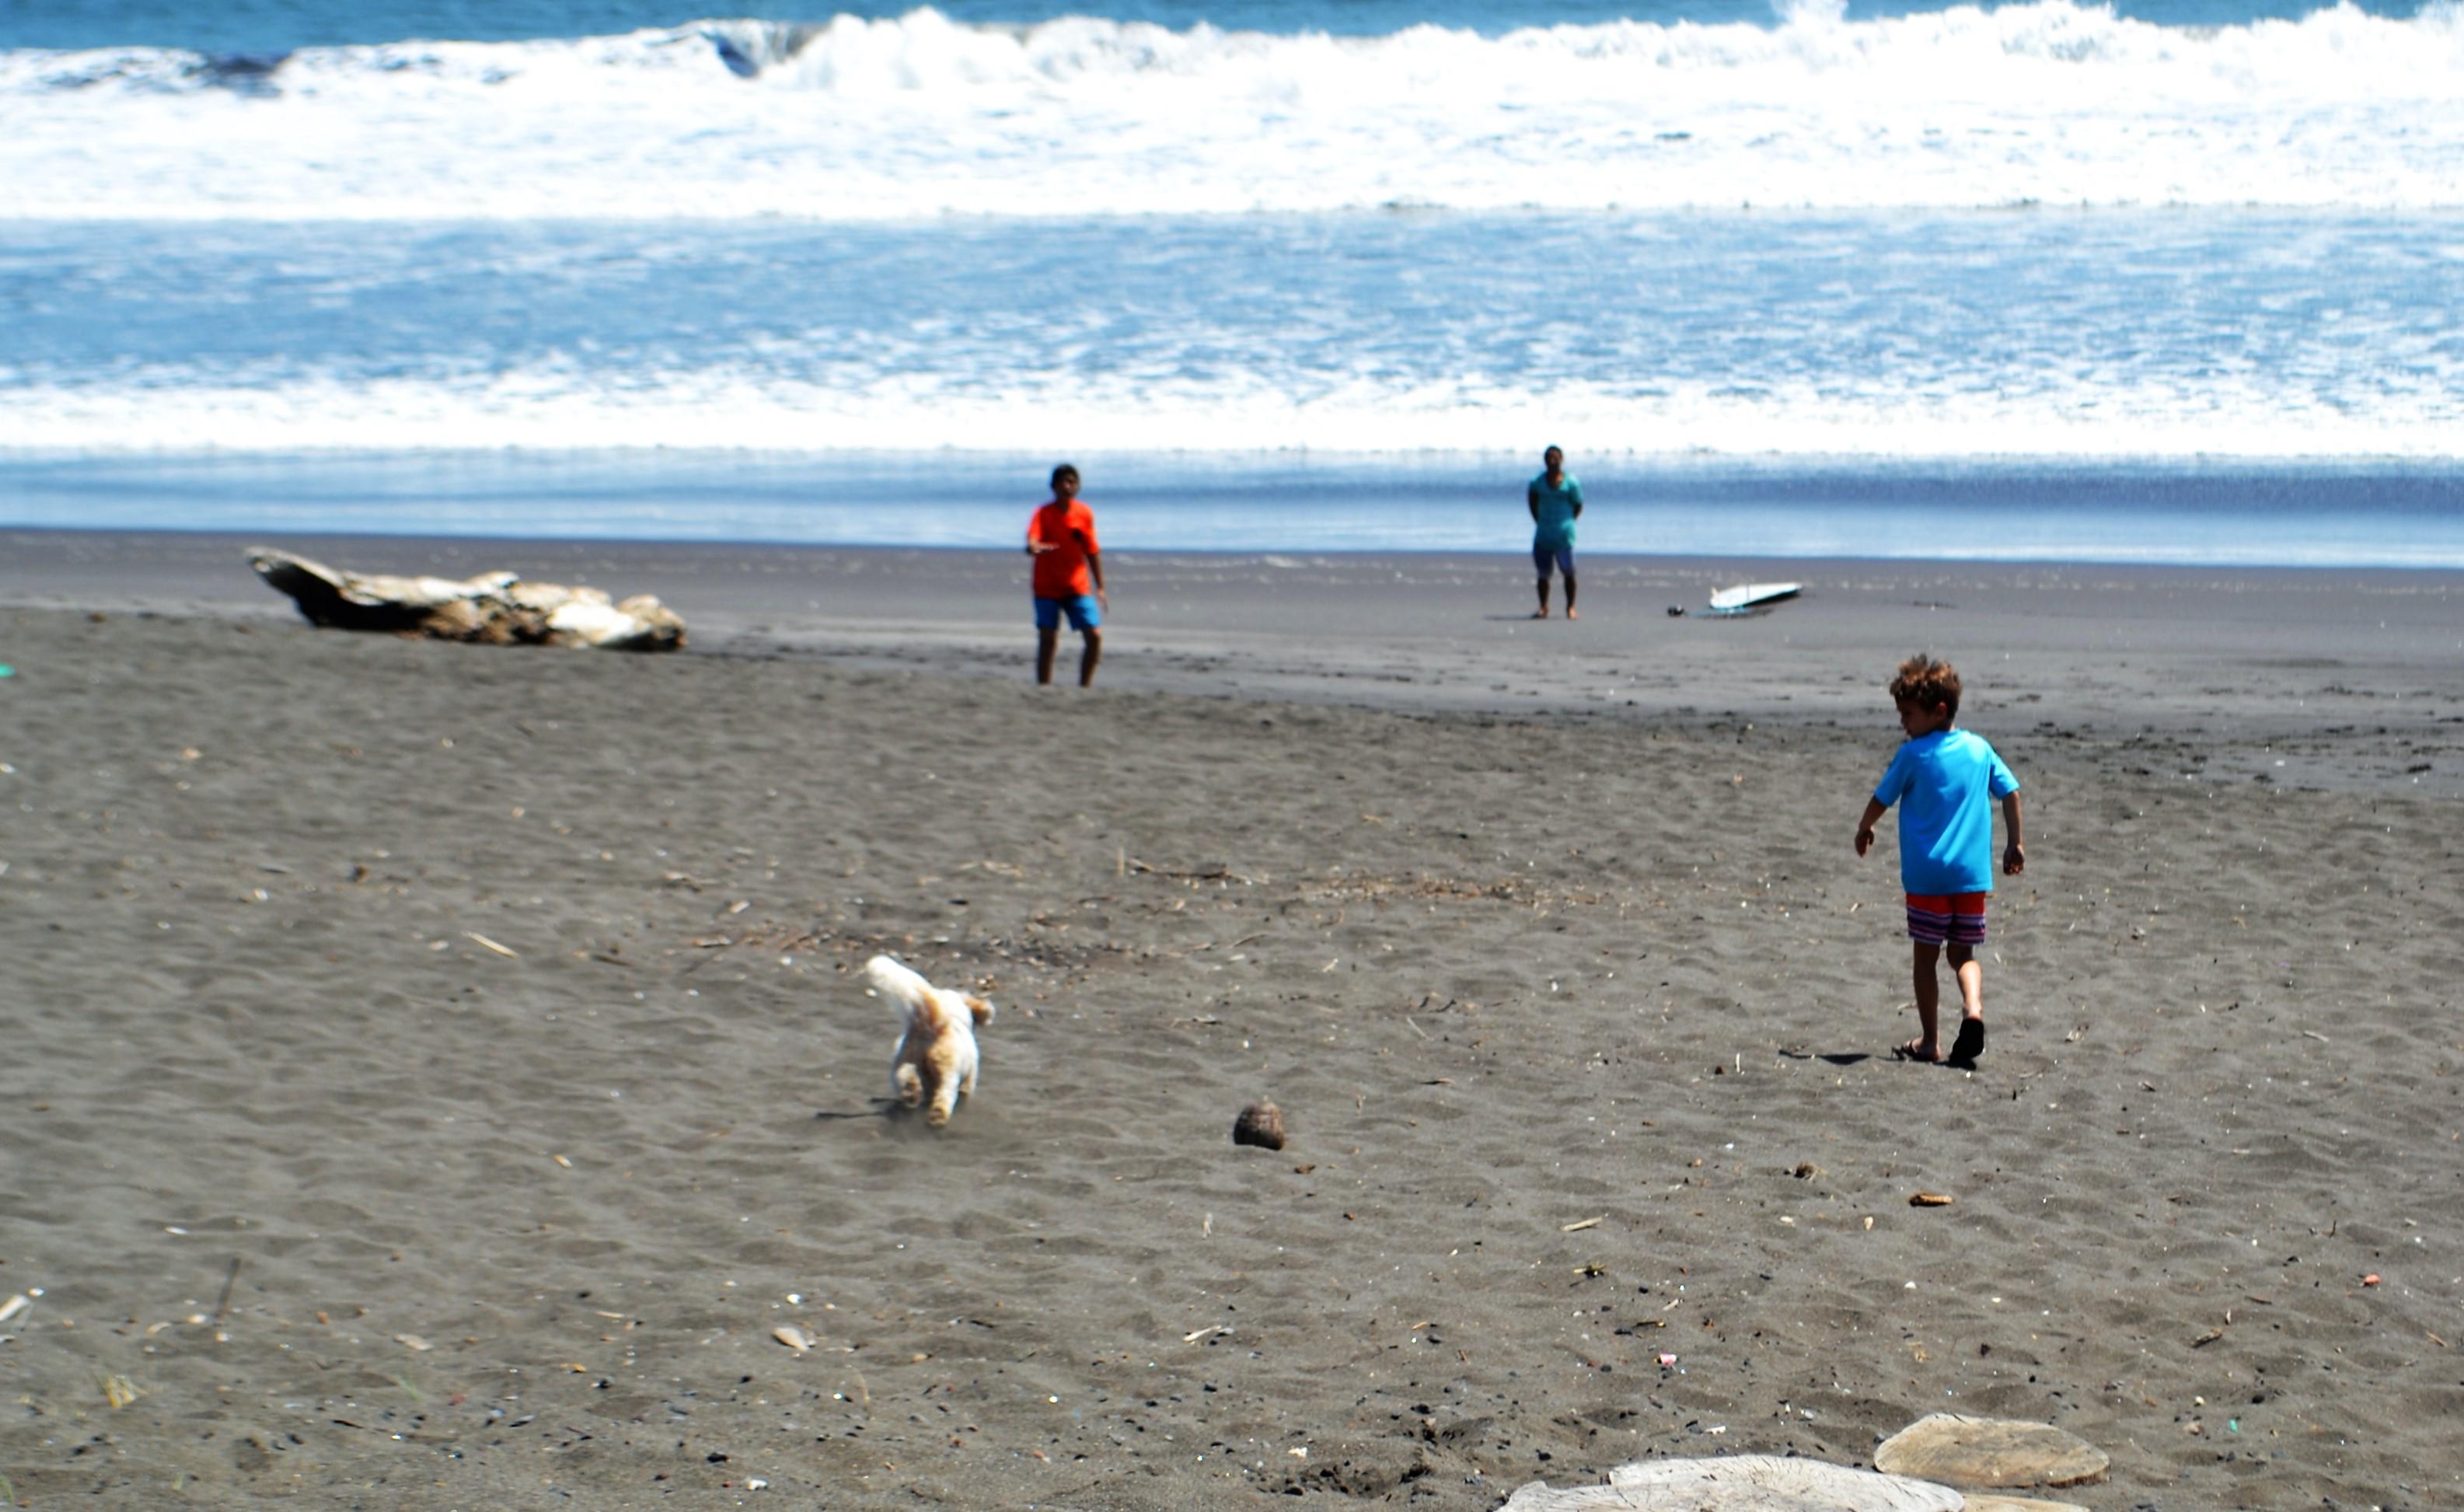 guatemala beaches, el paredon